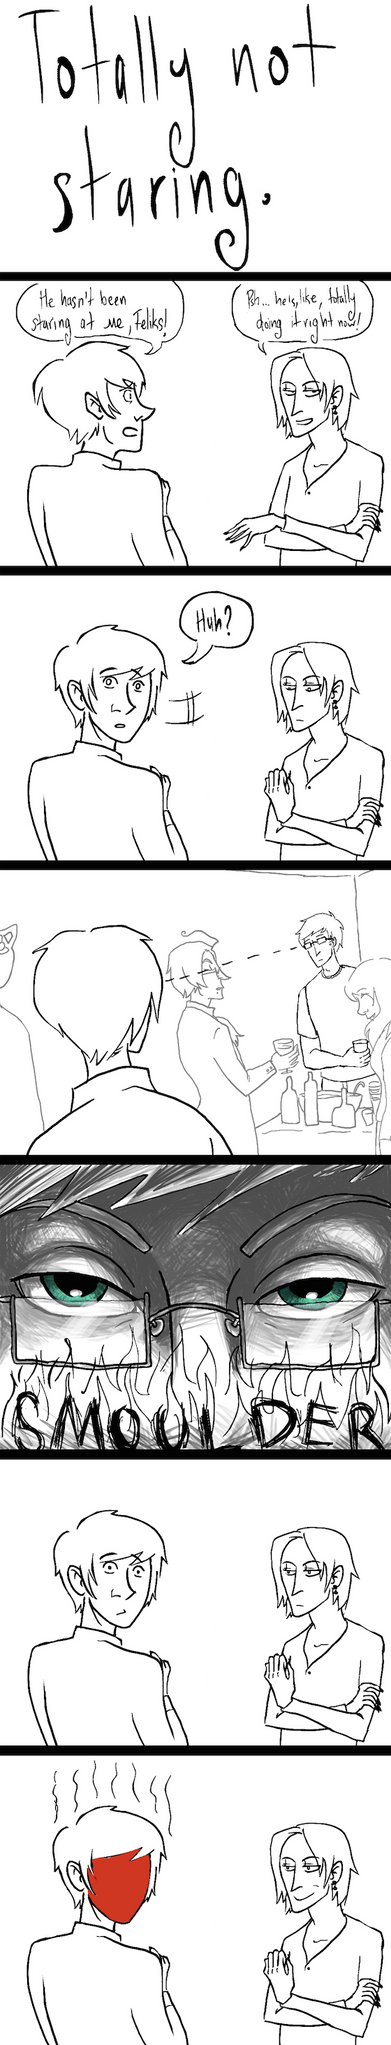 APH: Let Me In Comic by deepwoodwayfinder